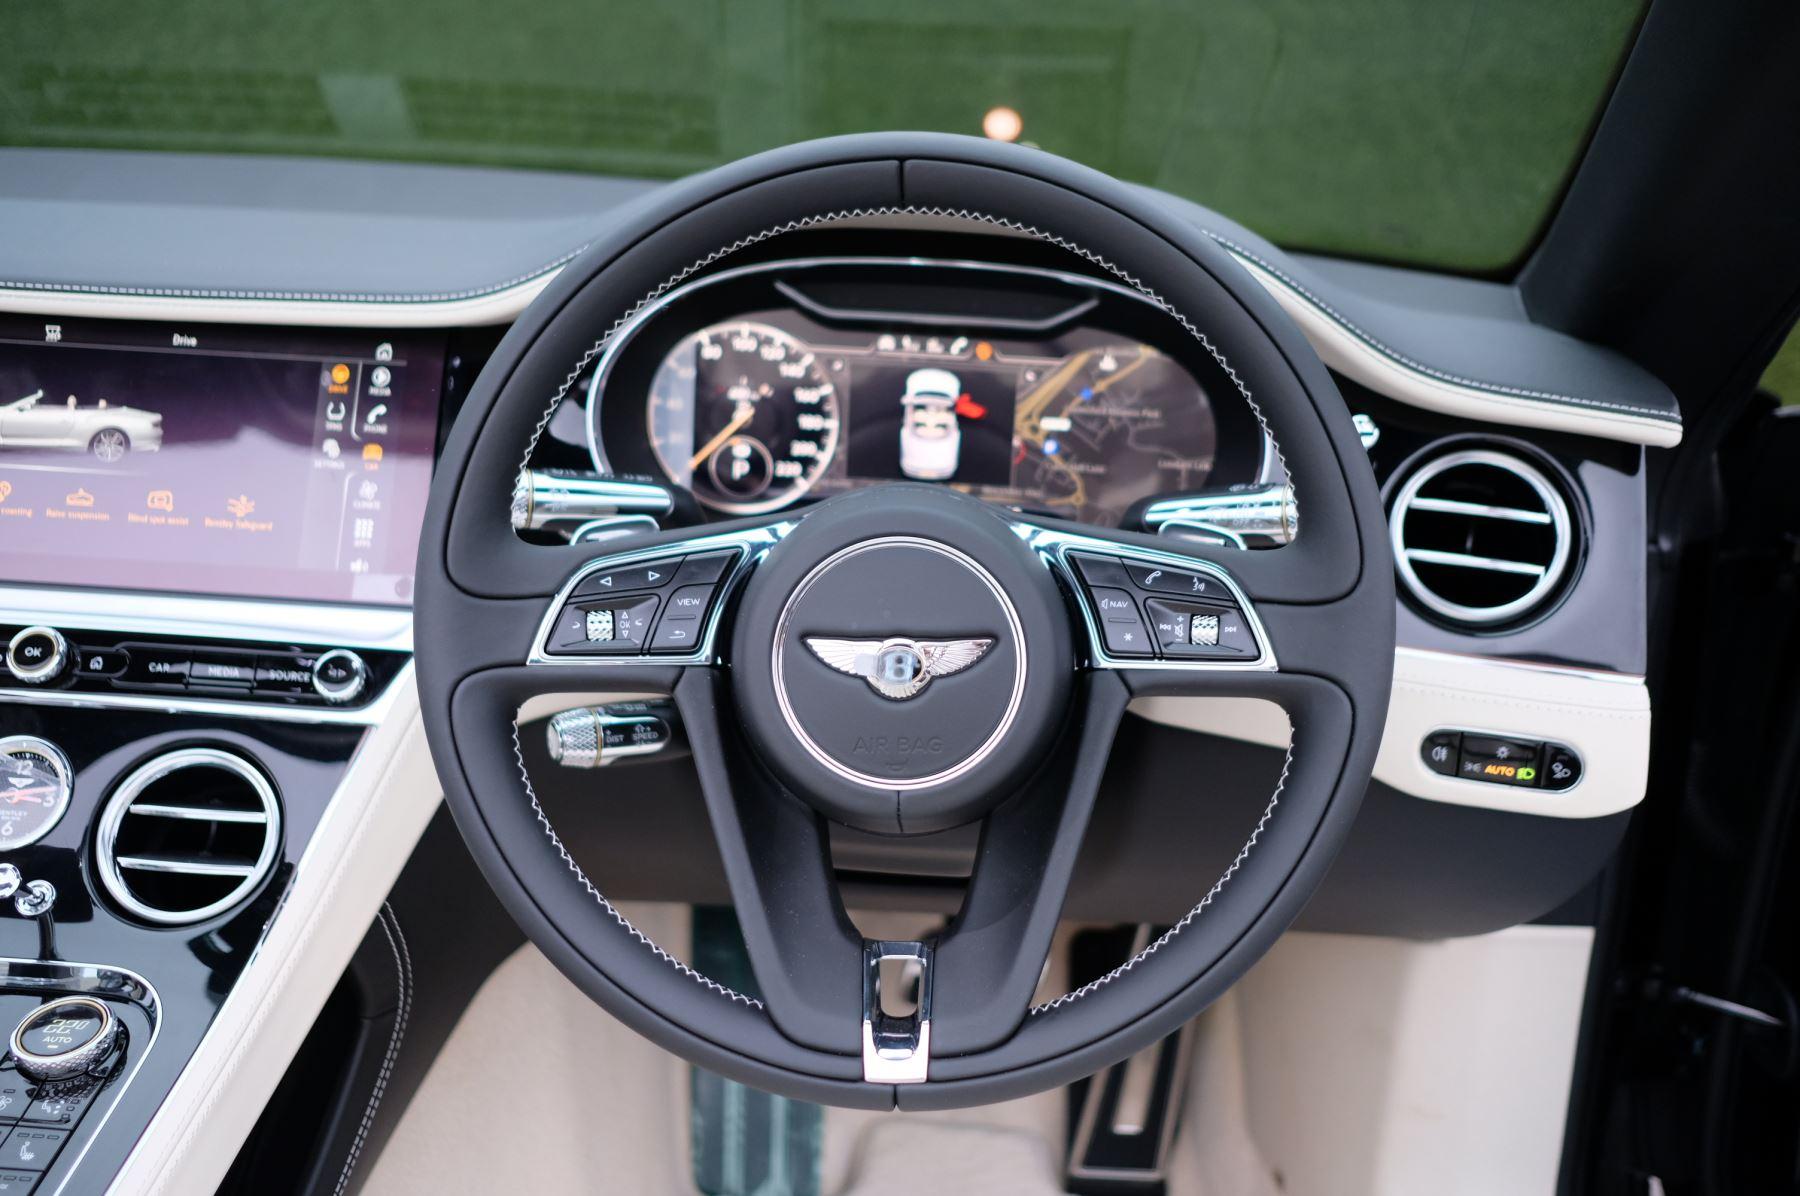 Bentley Continental GTC 4.0 V8 Mulliner Driving Spec 2dr Auto [Tour Spec] image 9